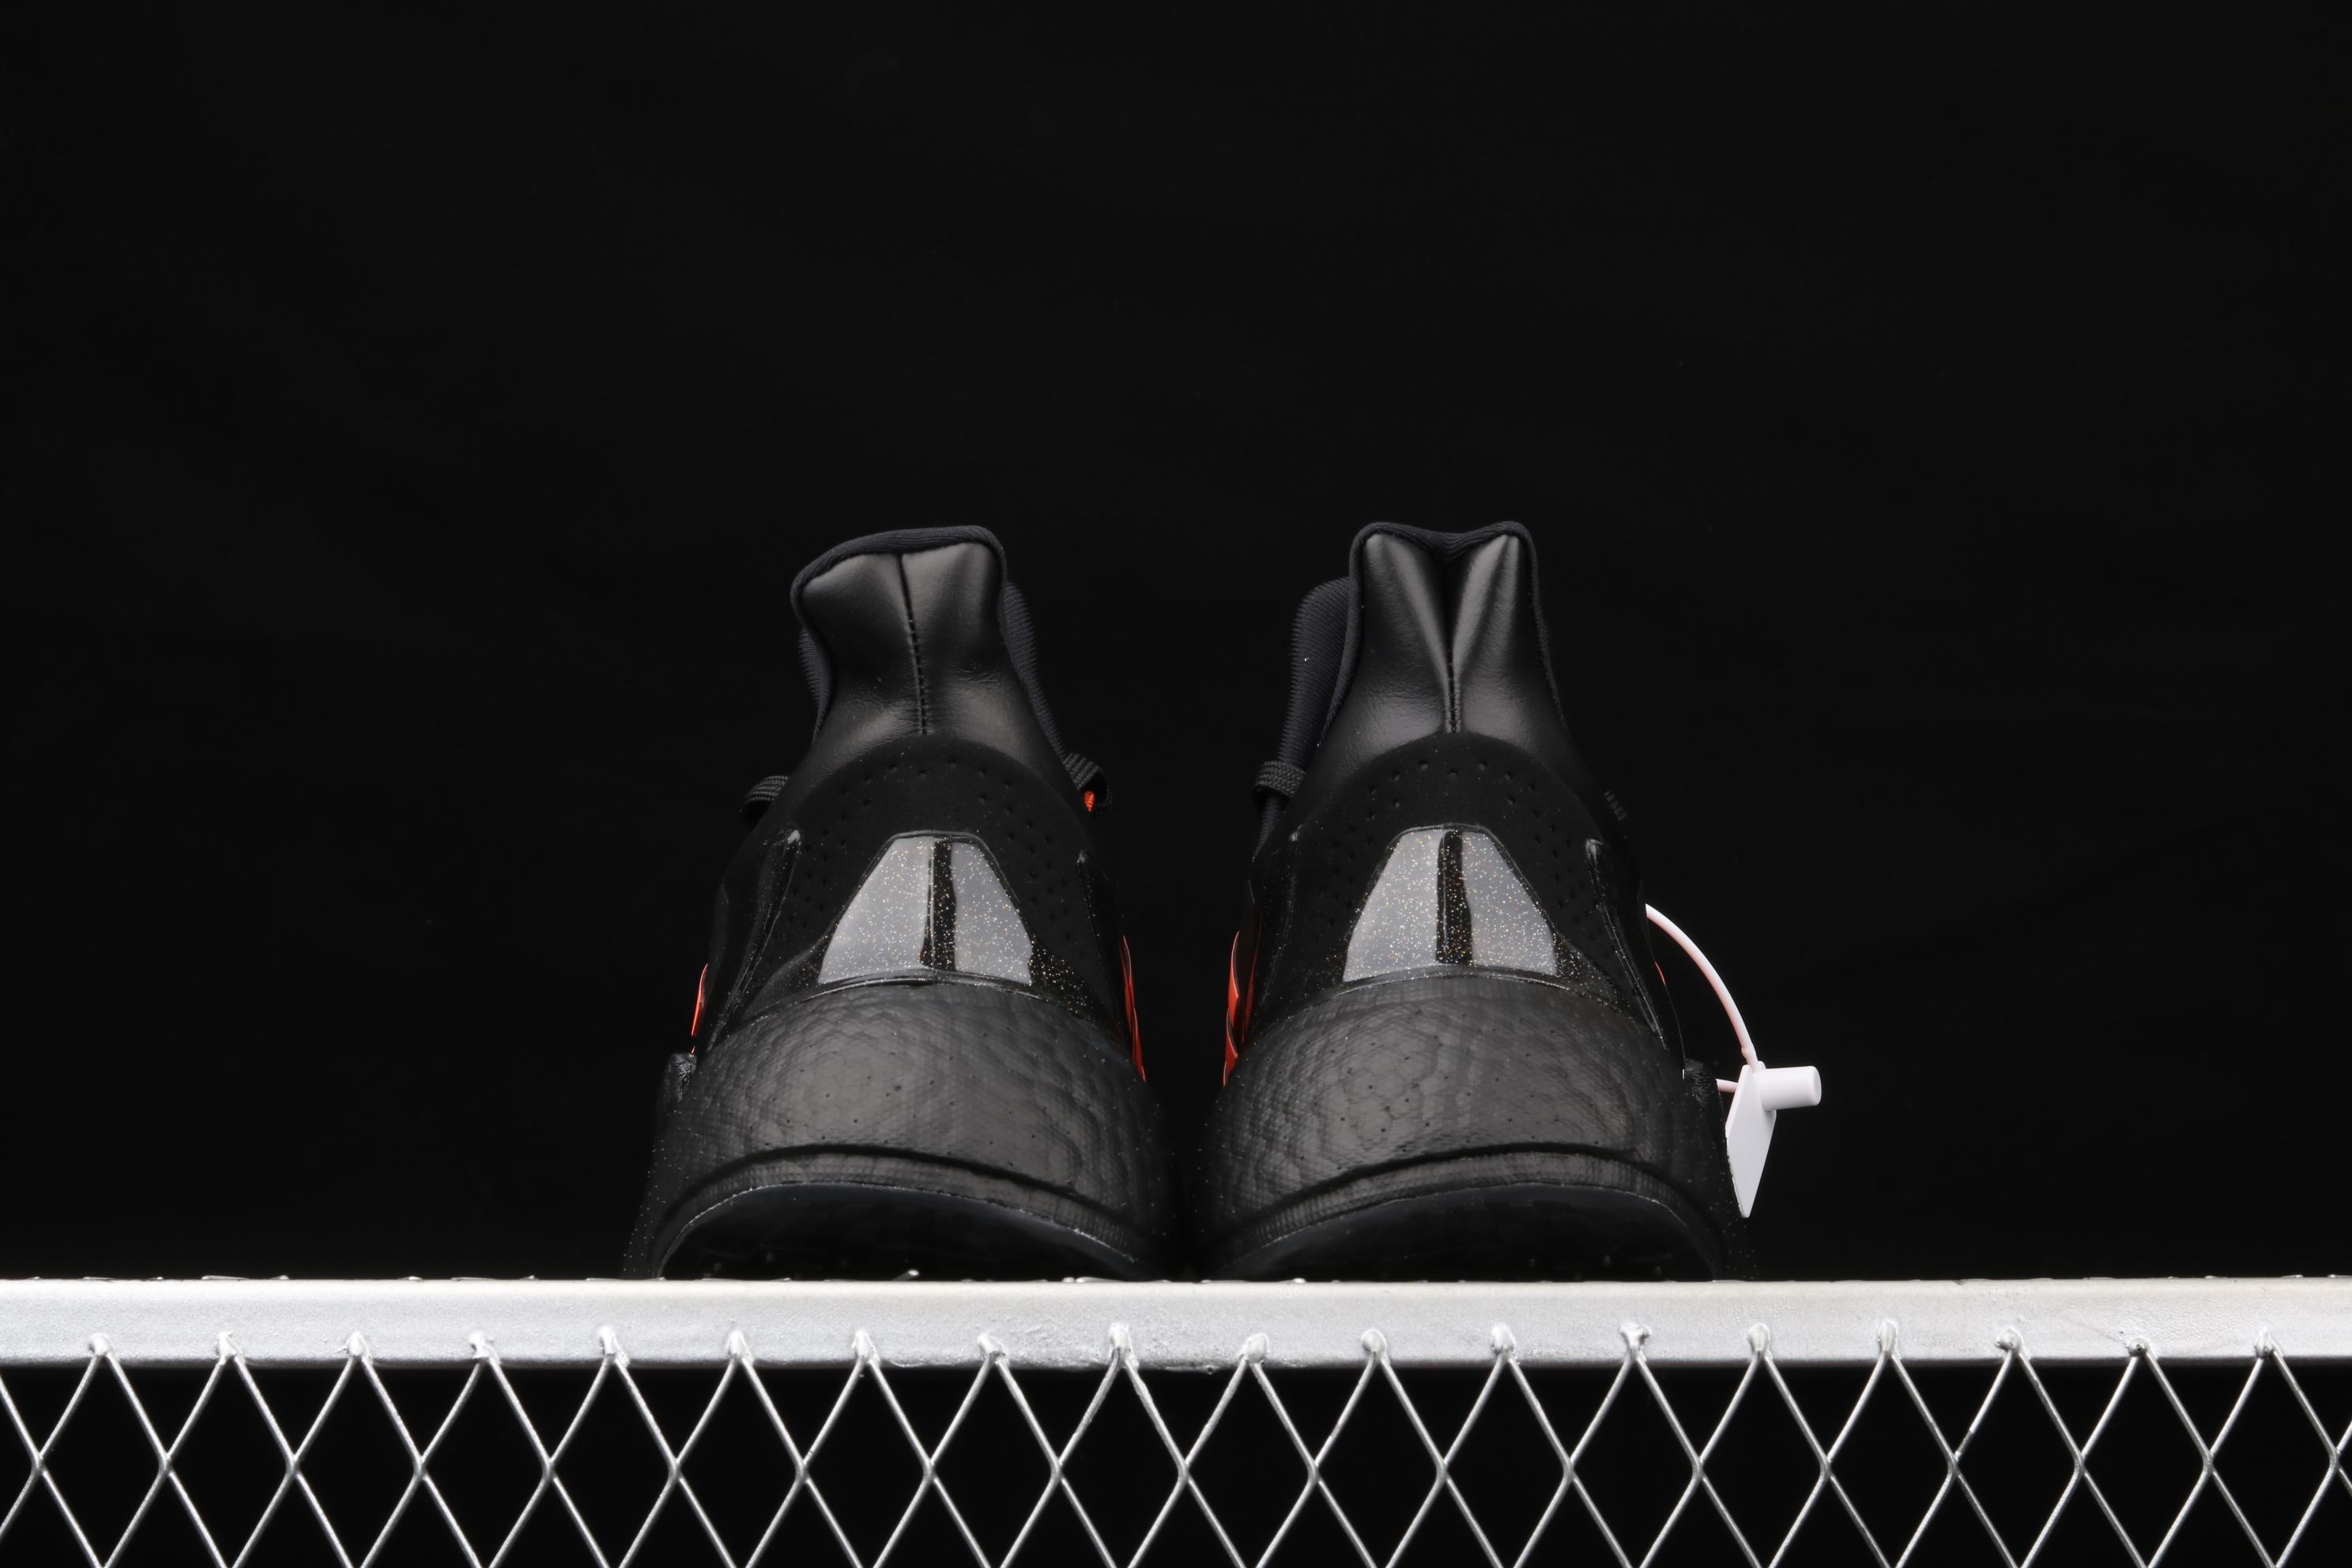 #ZG版本 Ad X9000L4 Boost FW5920 阿迪新款复古爆米花跑鞋